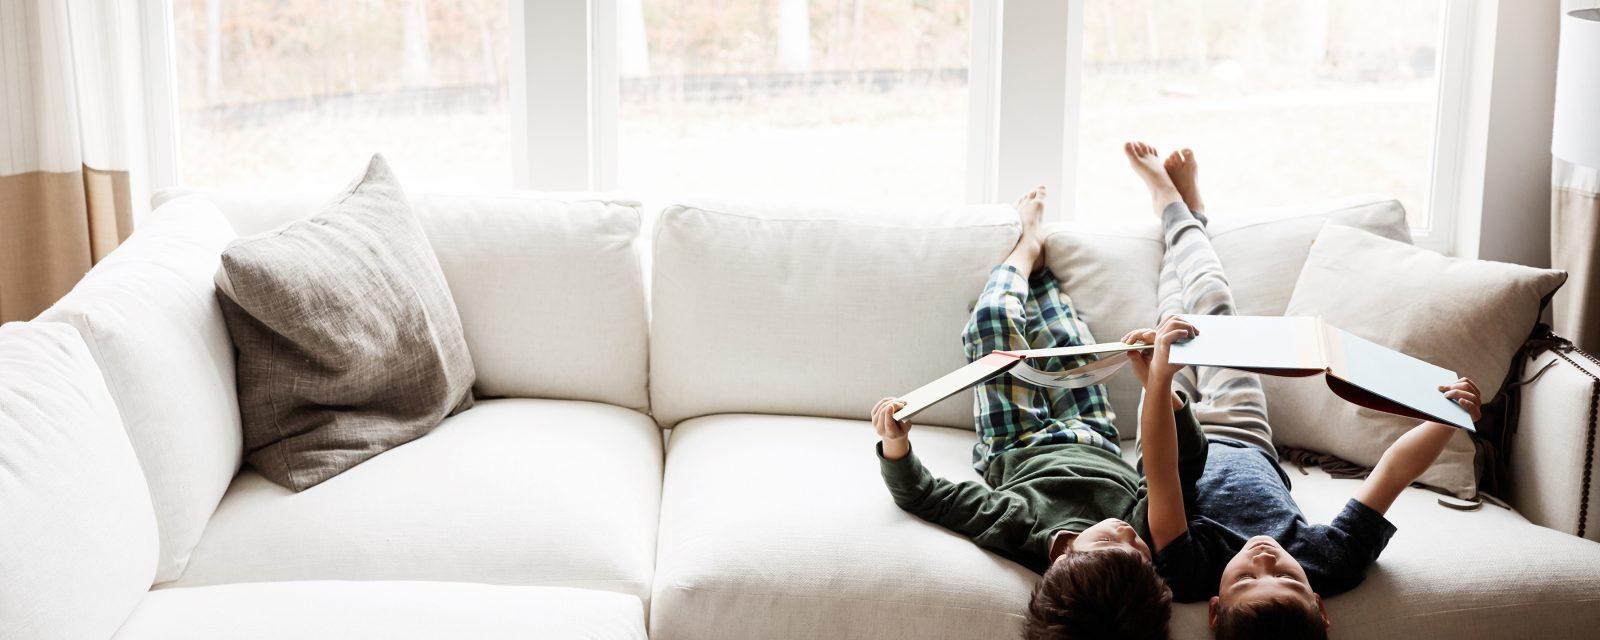 couch2-oecdivh8kgi5ek5xwspcayd1seagrpgbl3mb6ab0g0